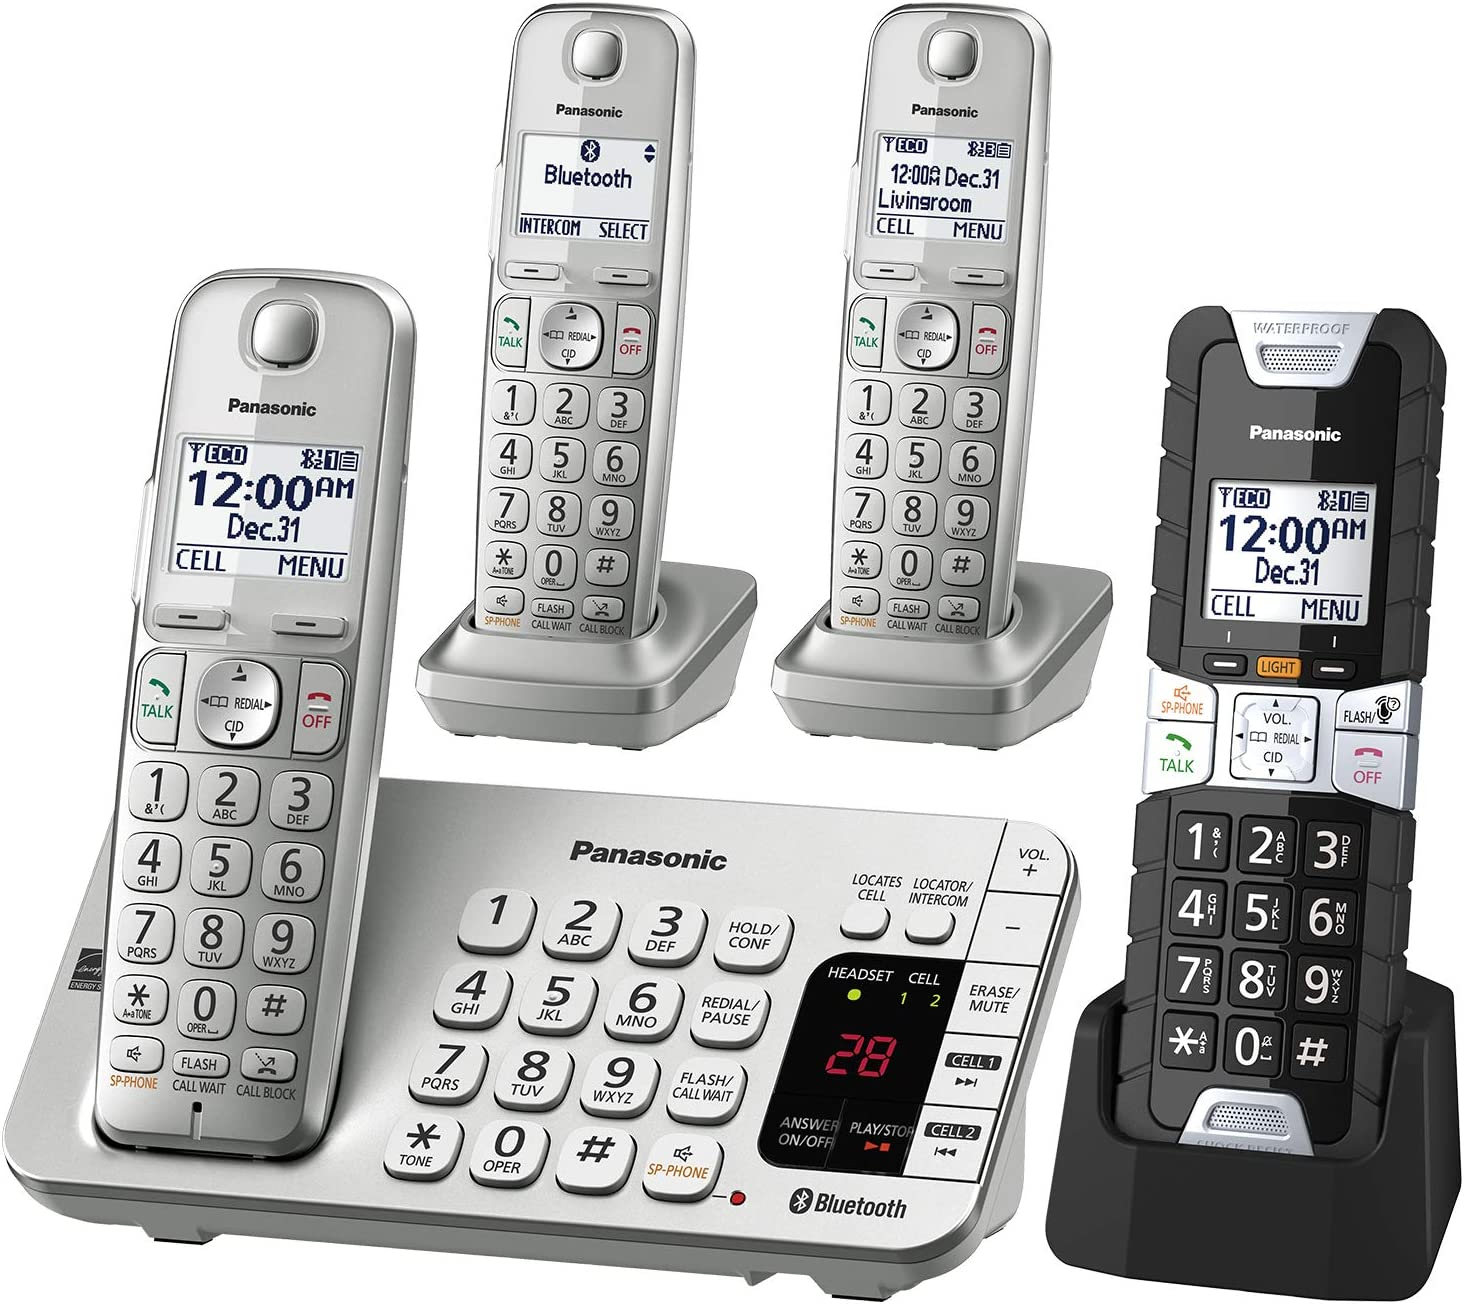 Panasonic KX-TGE484S2 DECT 6.0 4 Handset Landline Telephone Silver